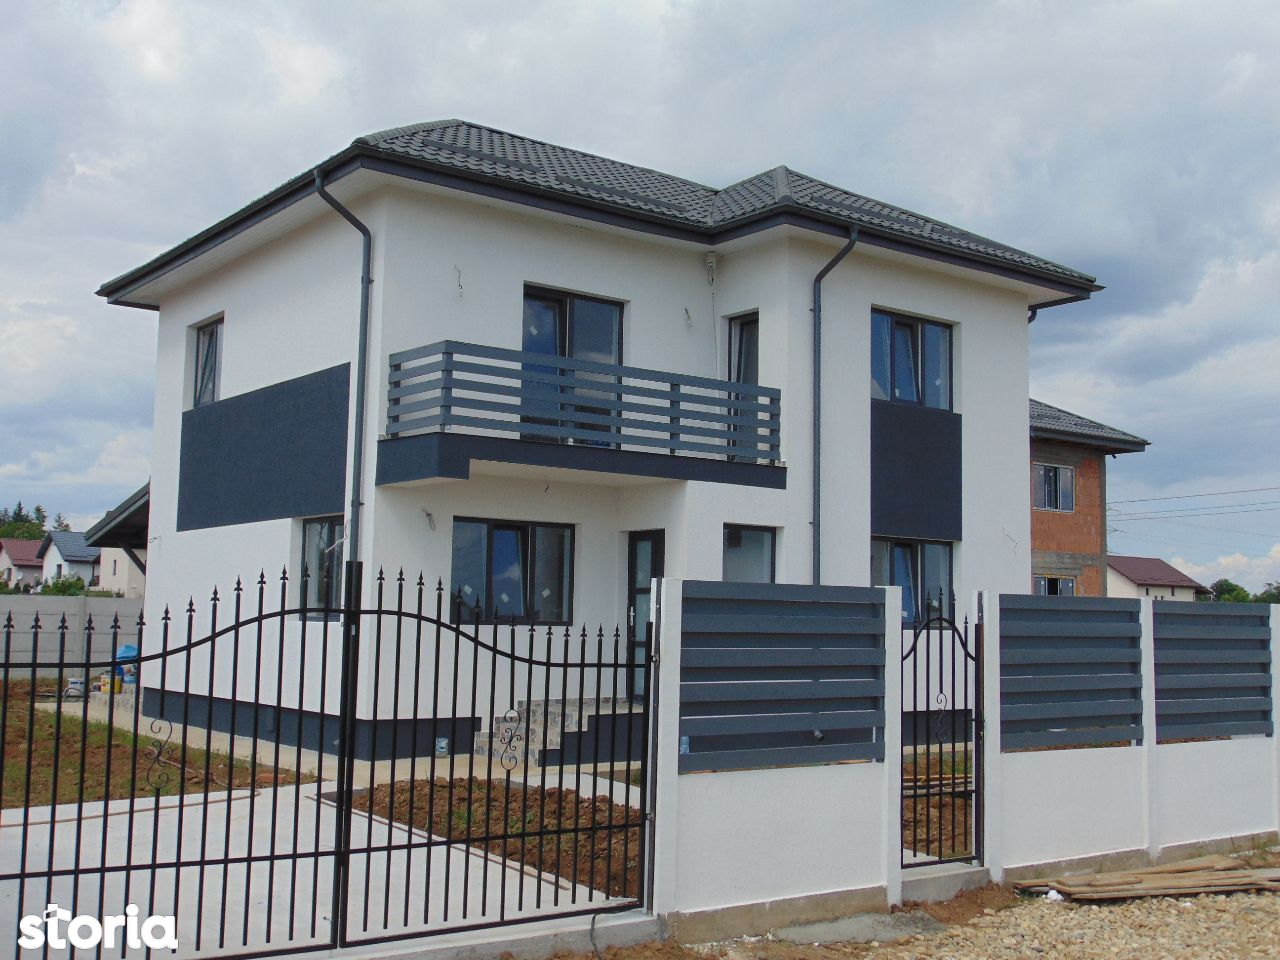 FARA COMISIOANE casa cu 4 camere si 2 bai P+1+pod terasa camera tehnic